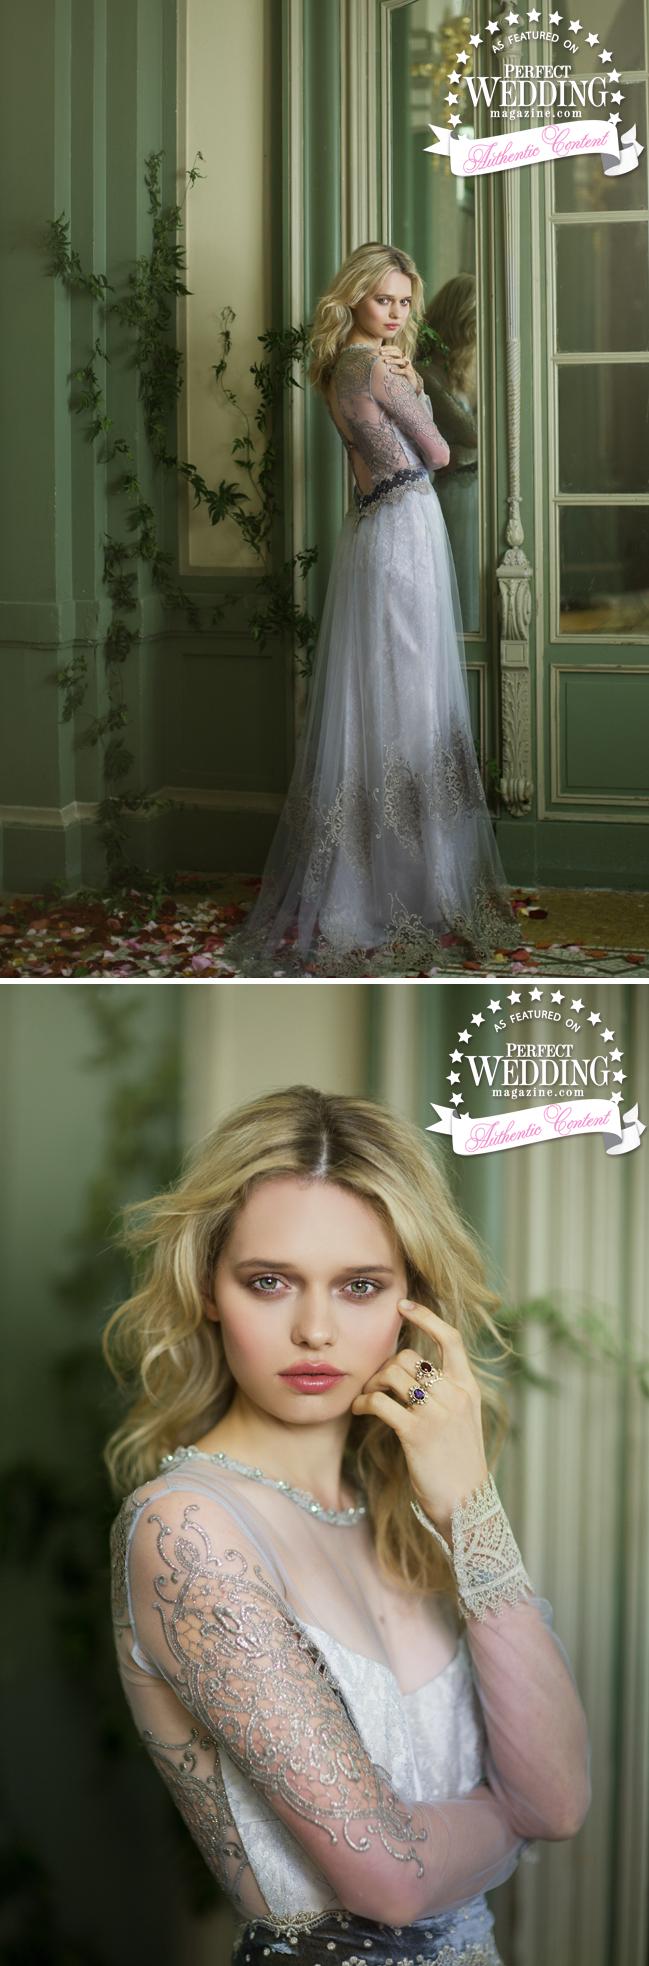 Claire Pettibone, The Gilded Age, Perfect Wedding Magazine, Bridal fashion, Bridal Fall 2016, Bridal Trends